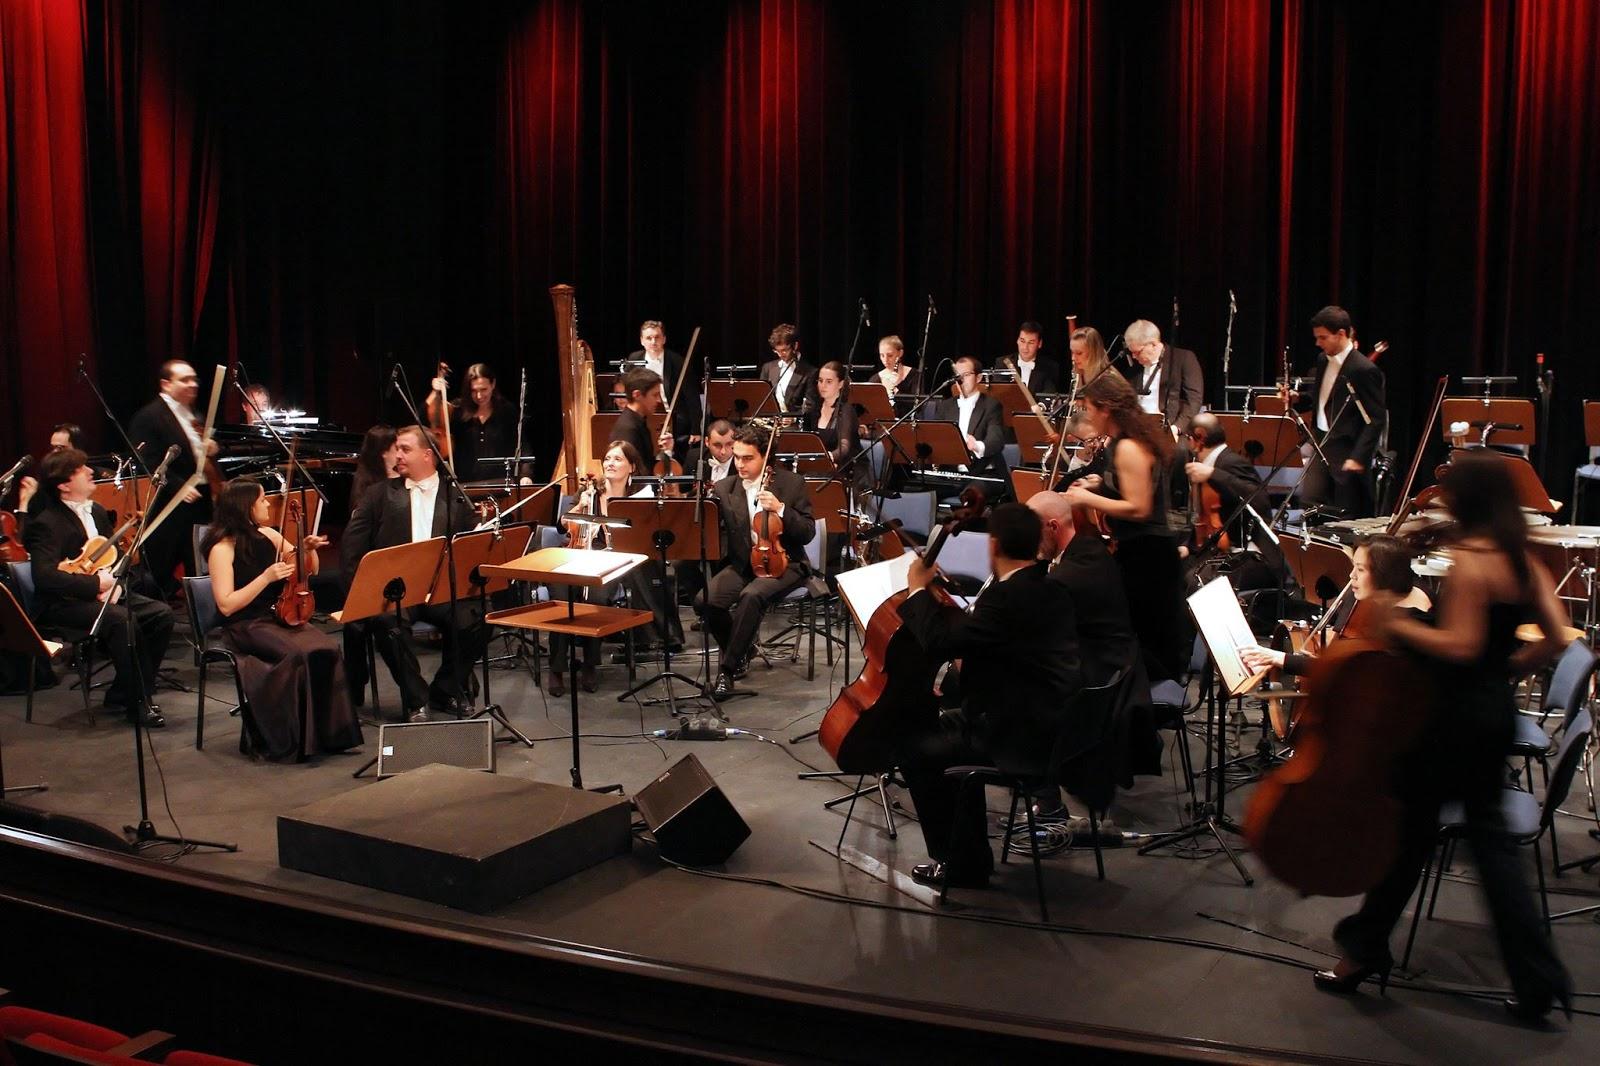 Photo of Premiere in Portugal of Penderecki's work opens season of Metropolitana